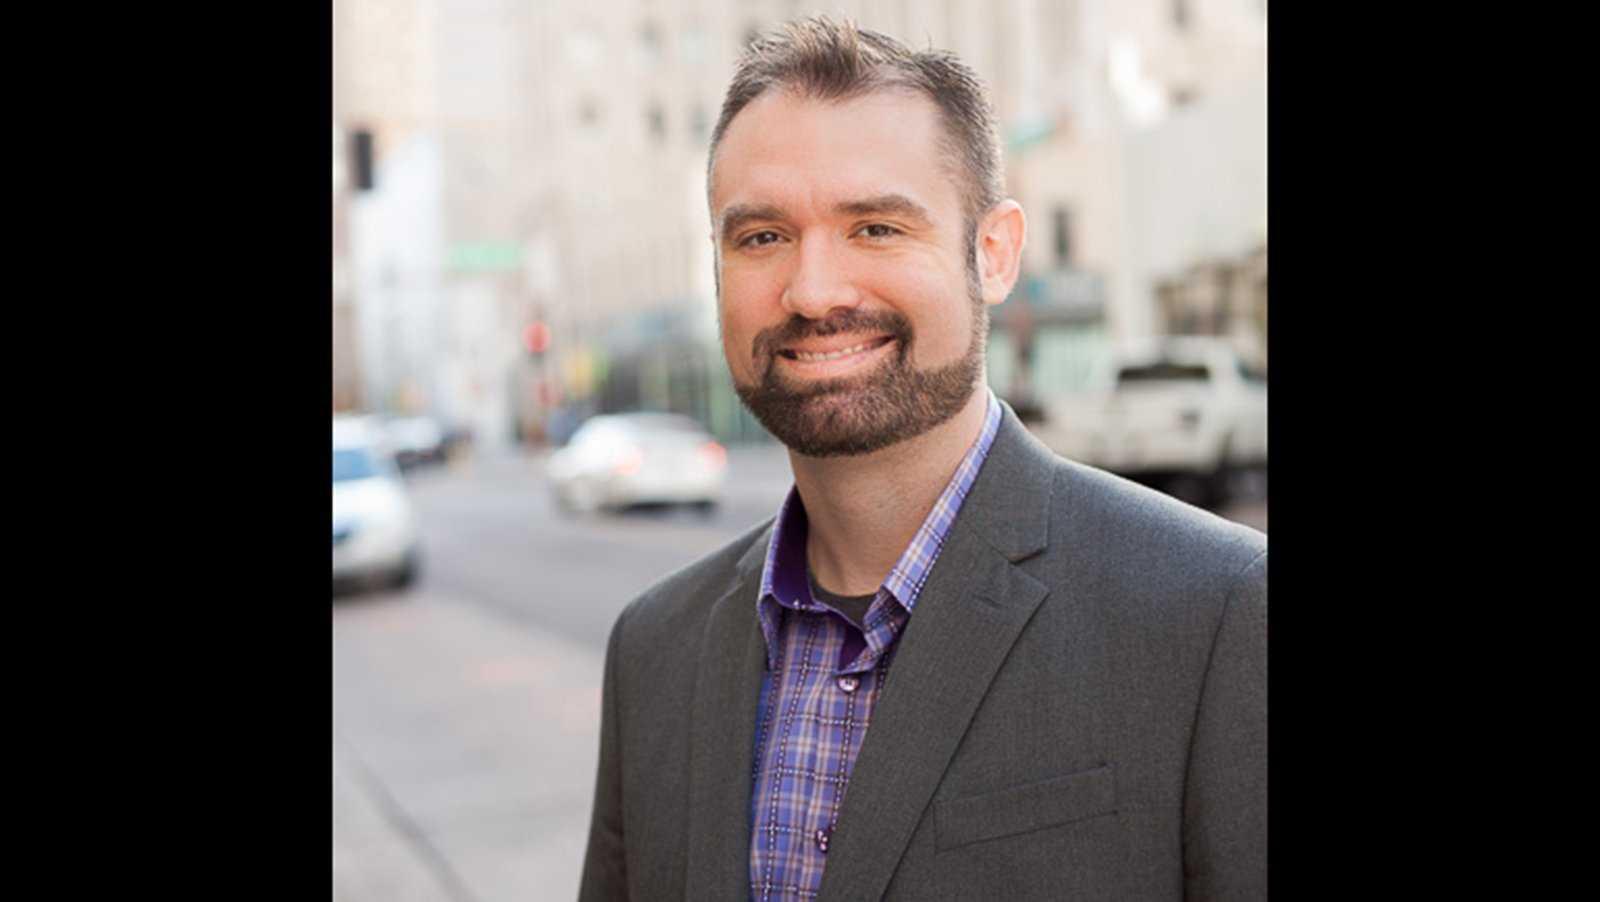 Arizona gubernatorial candidate Noah Dyer